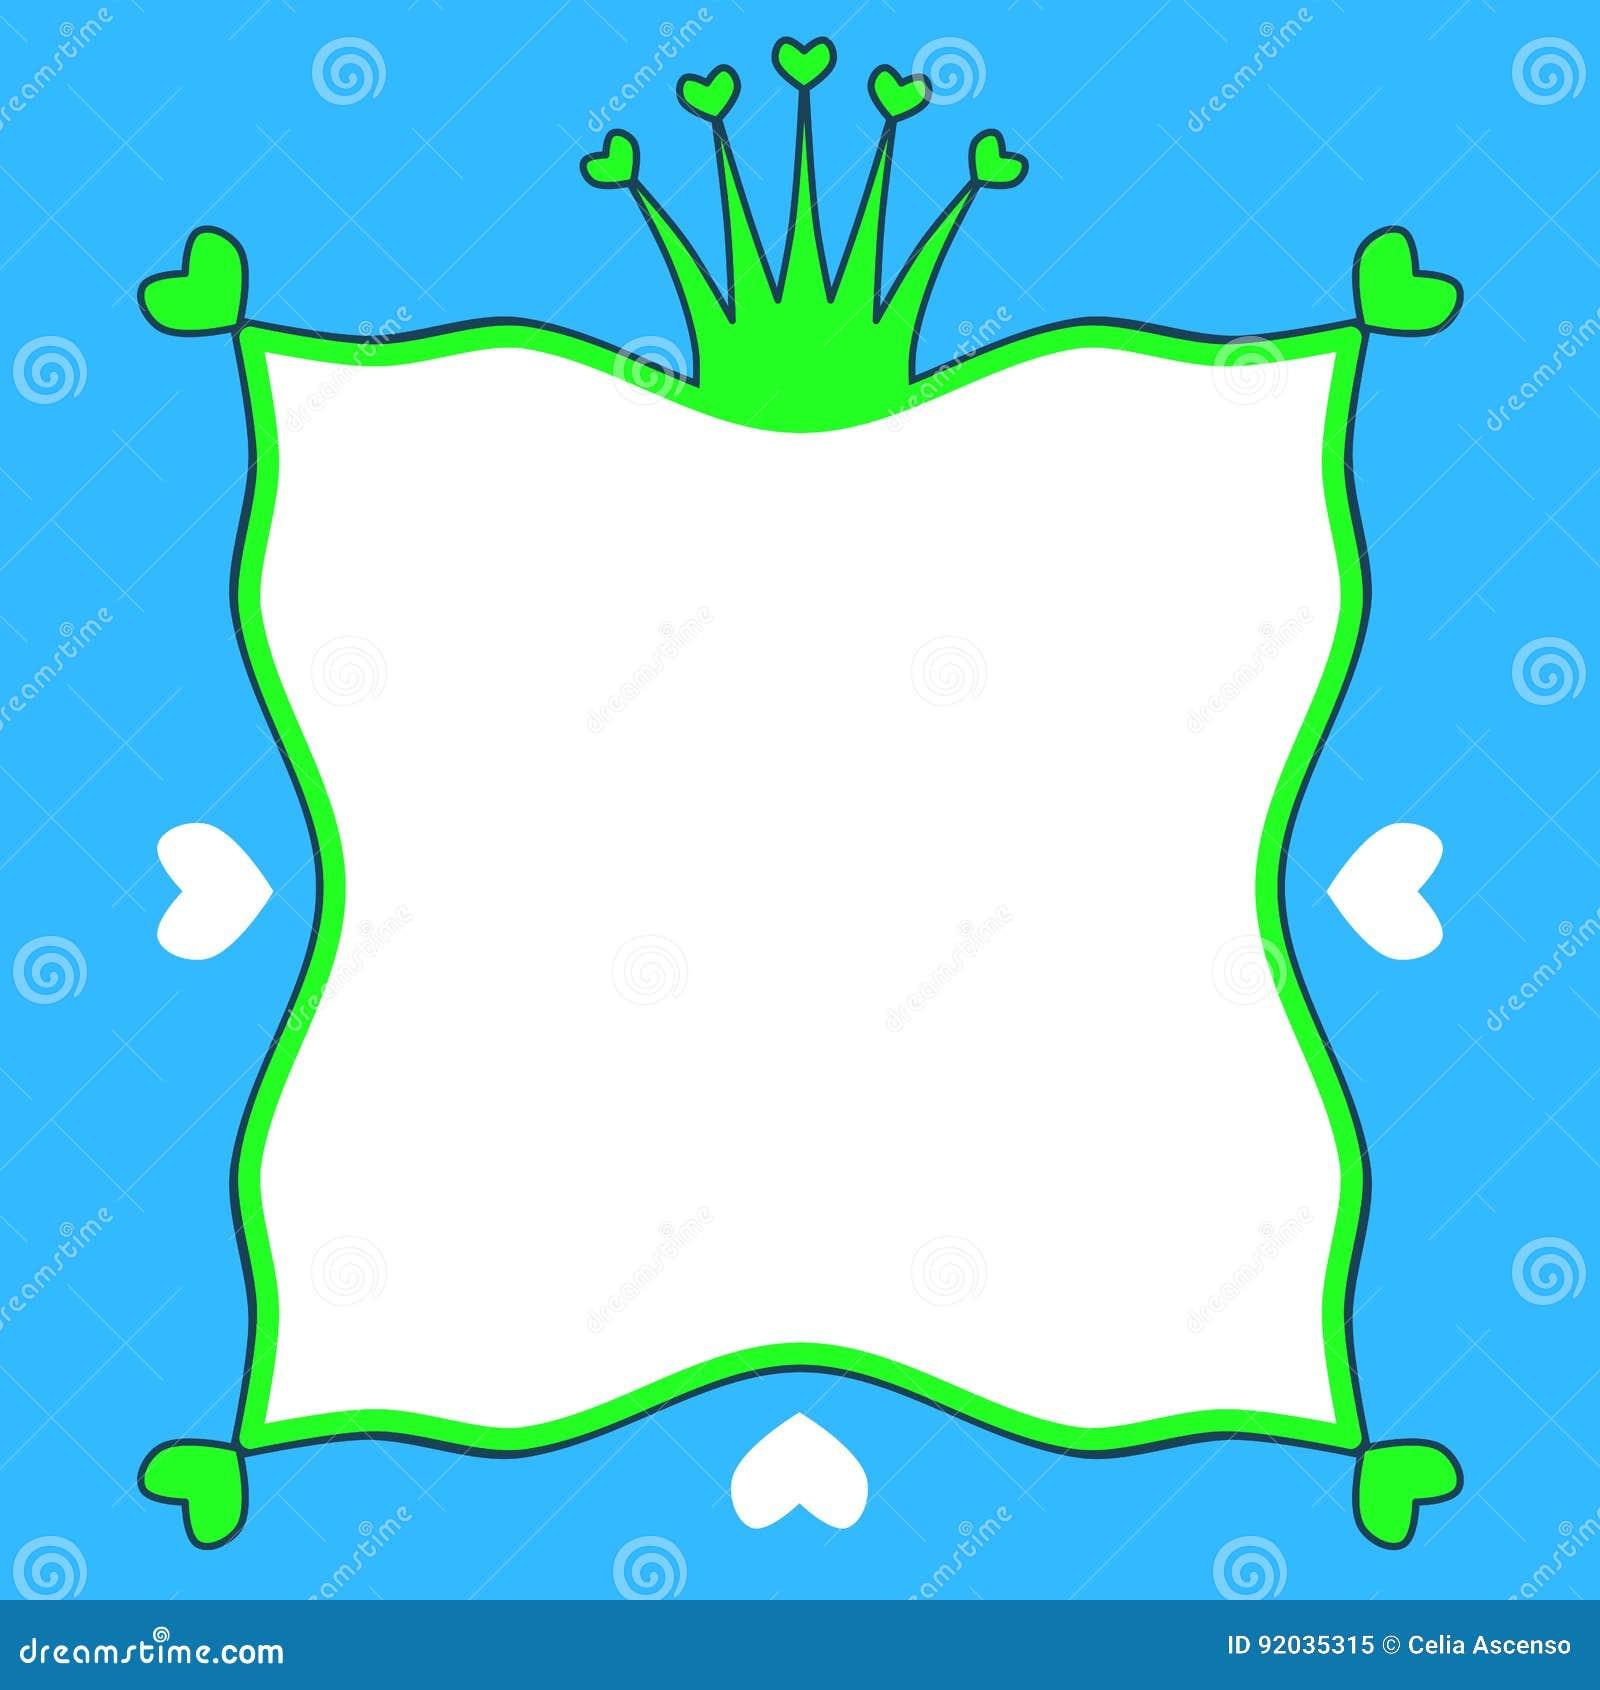 Rahmengrenze Prinzen Frog Crown Hearts Stock Abbildung ...